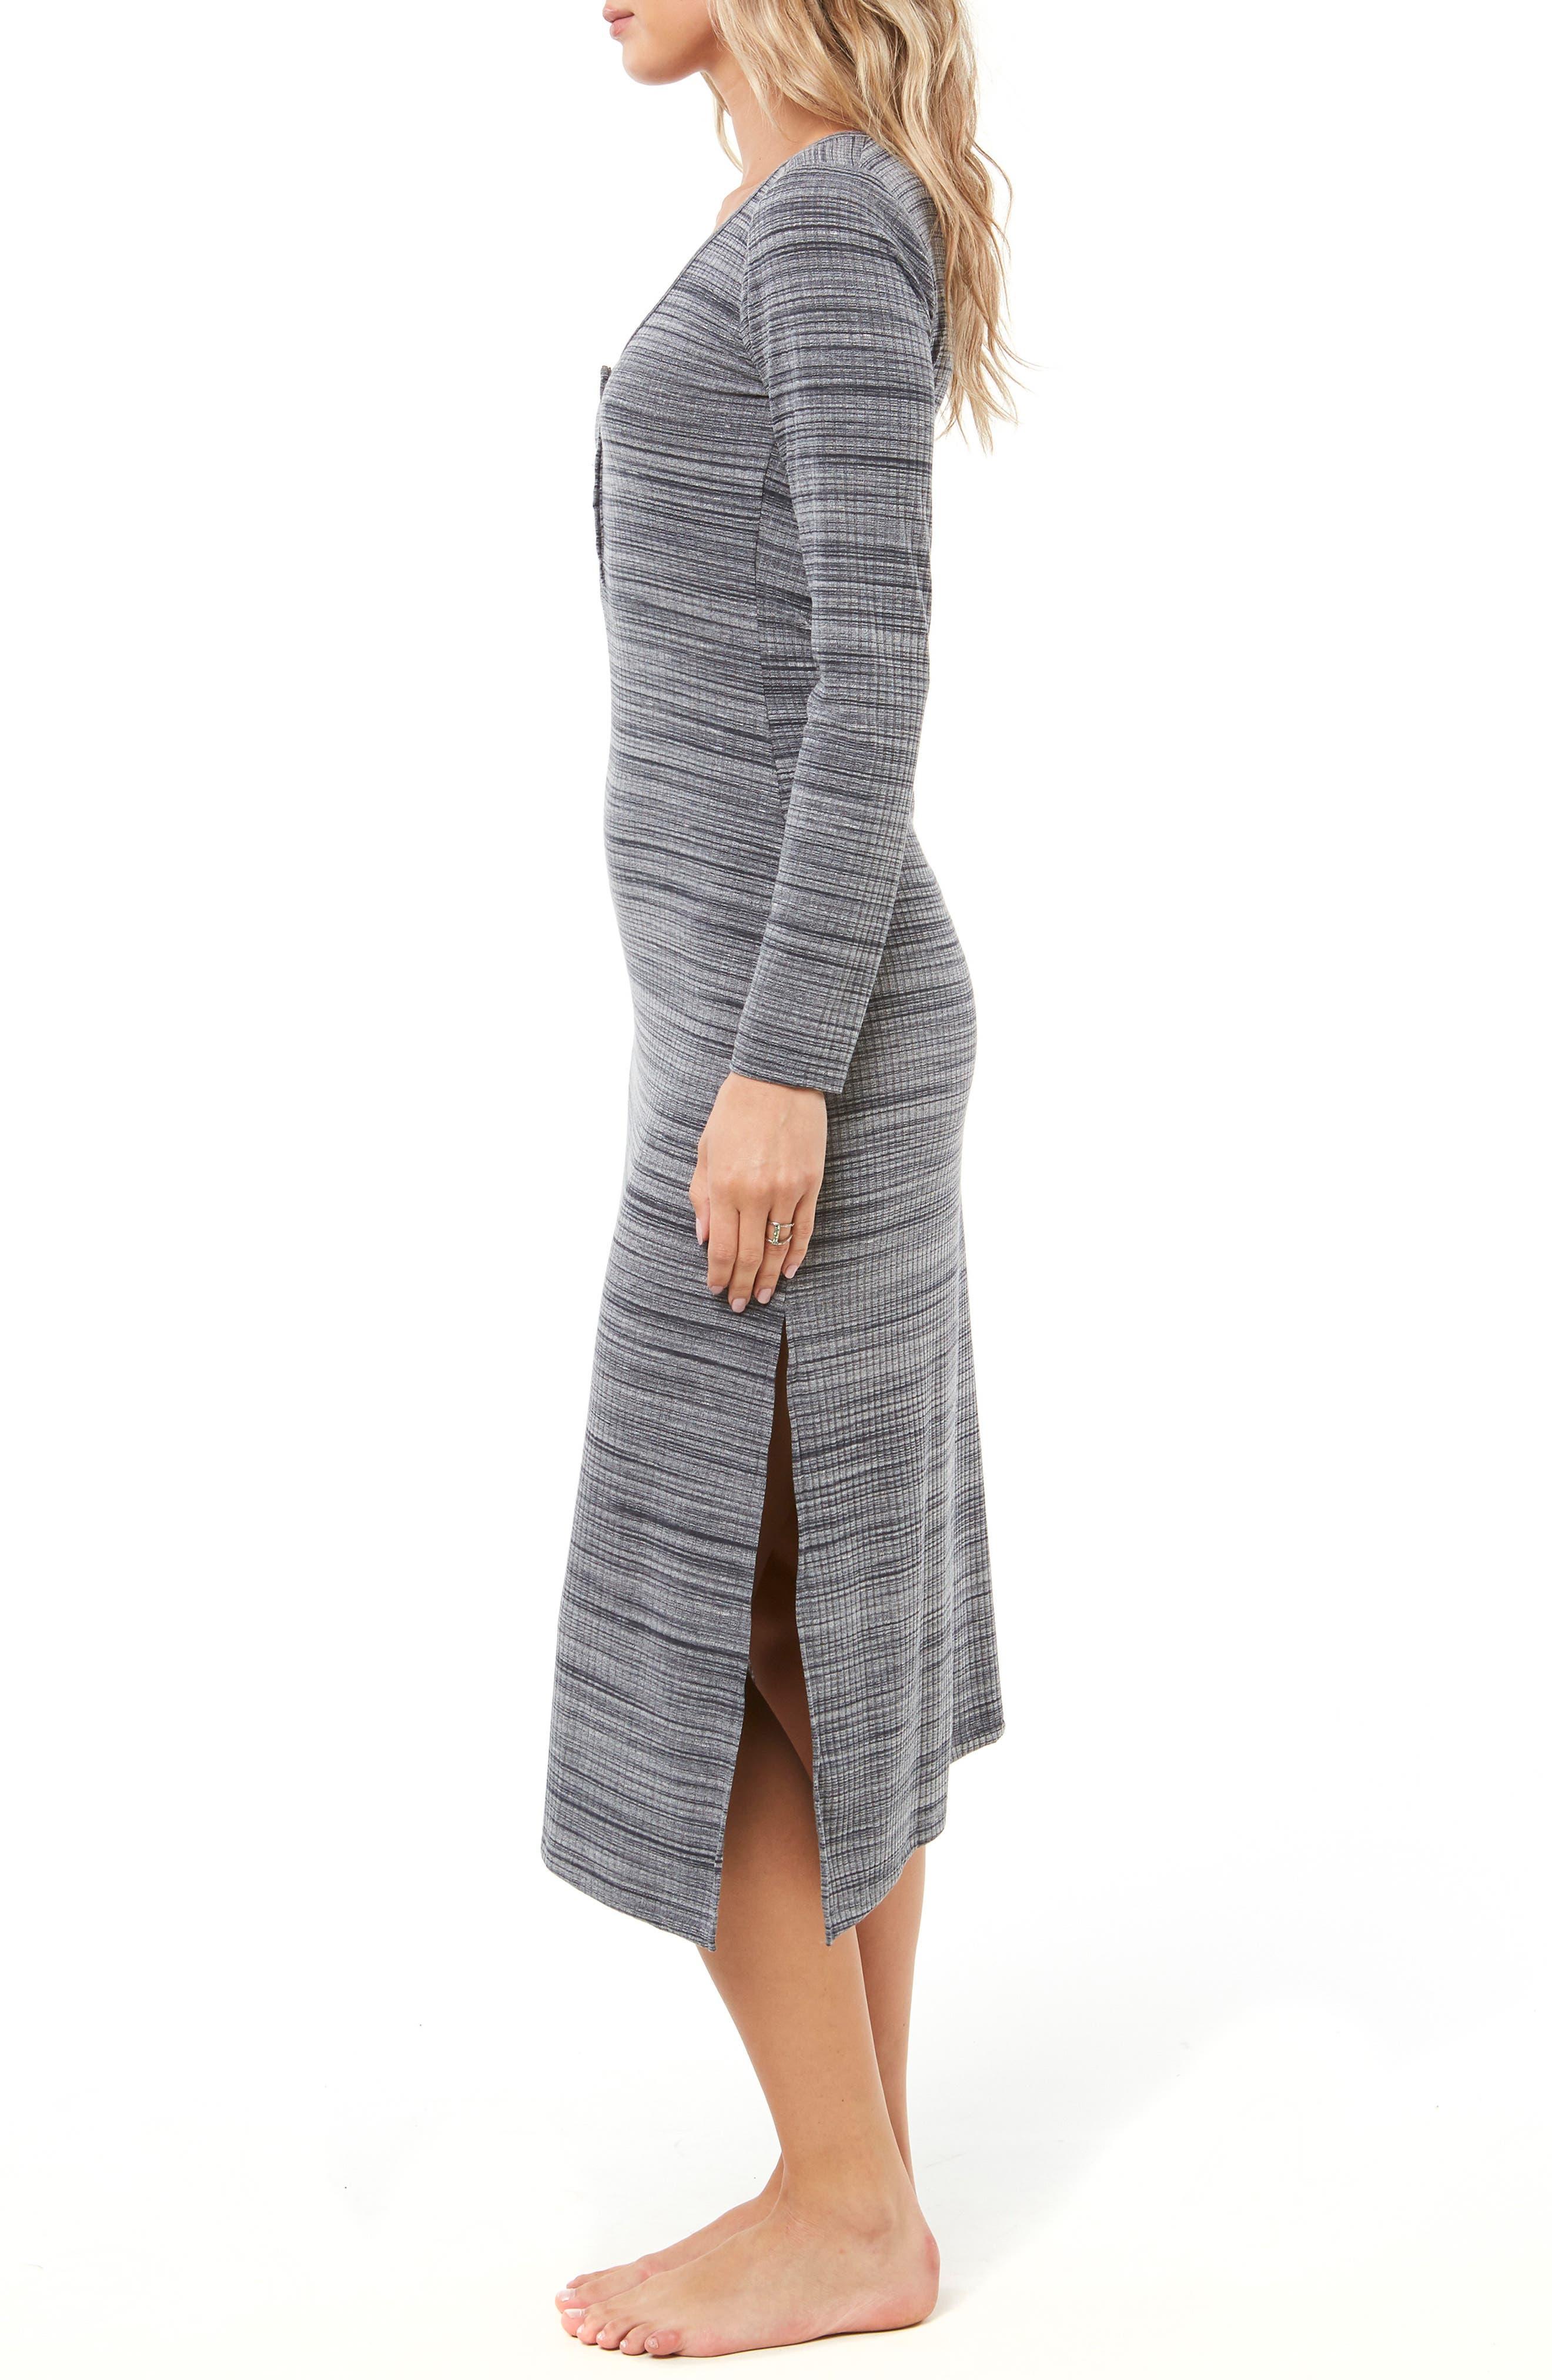 Shellsea Knit Midi Dress,                             Alternate thumbnail 3, color,                             INDIAN TEAL